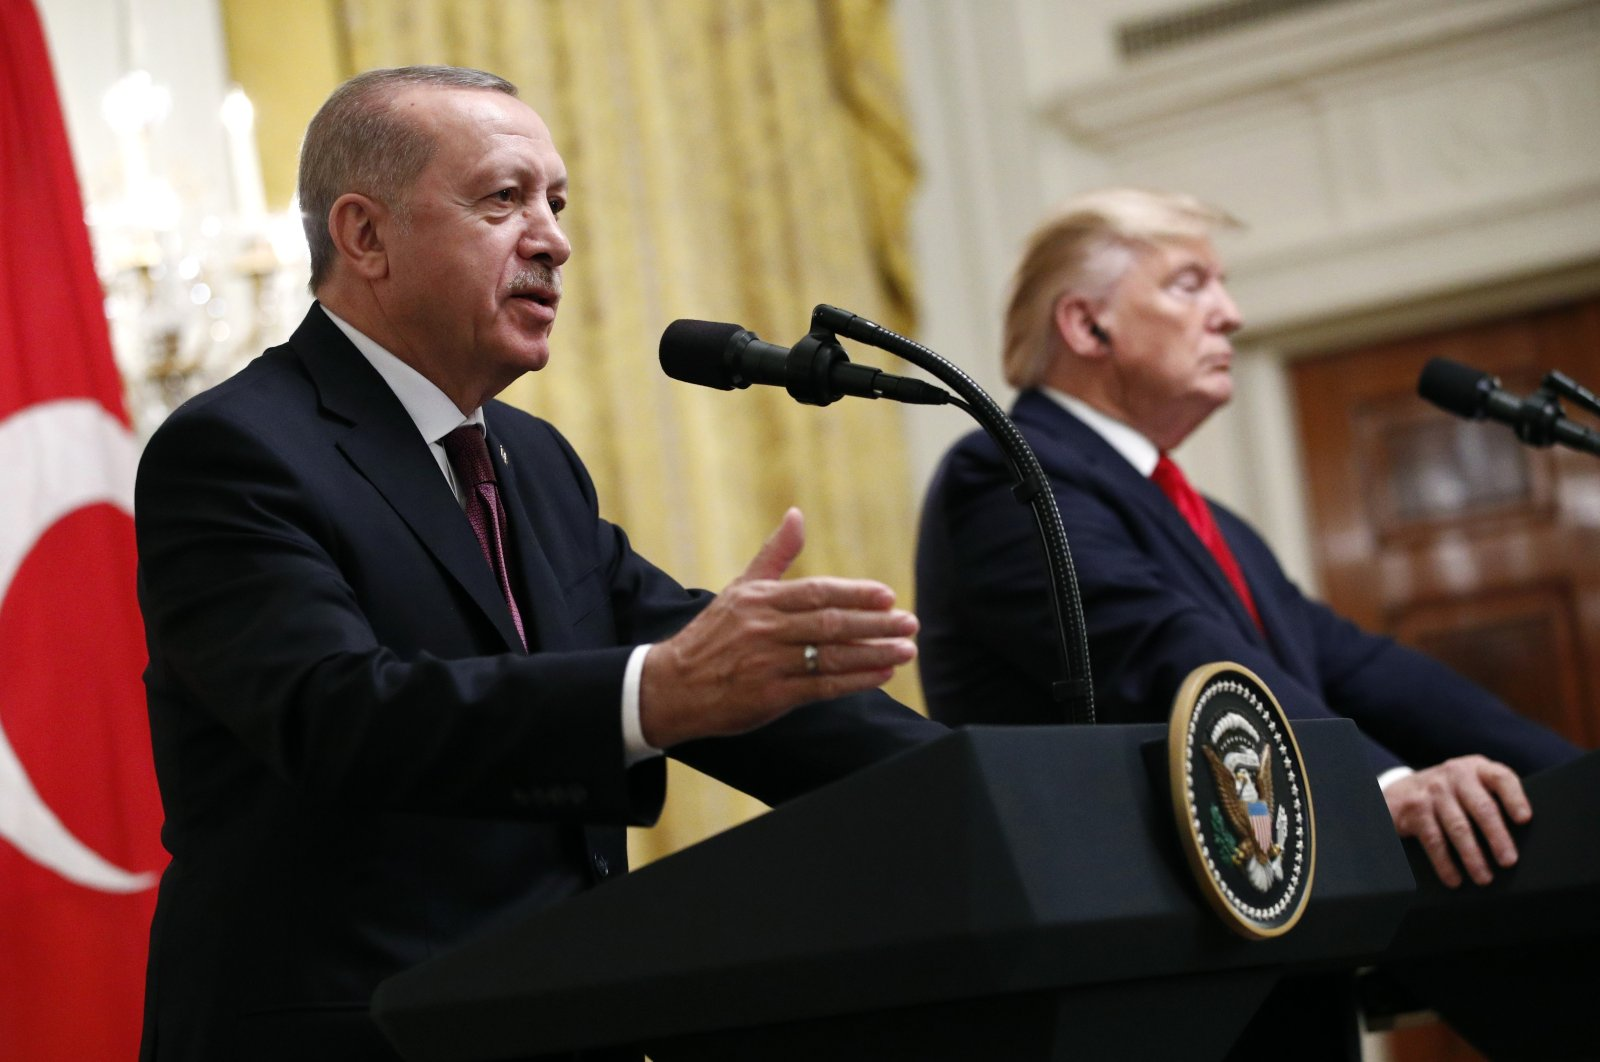 President Recep Tayyip Erdoğan speaks at a news conference alongside President Donald Trump in the East Room of the White House, Nov. 13, 2019. (AP Photo)